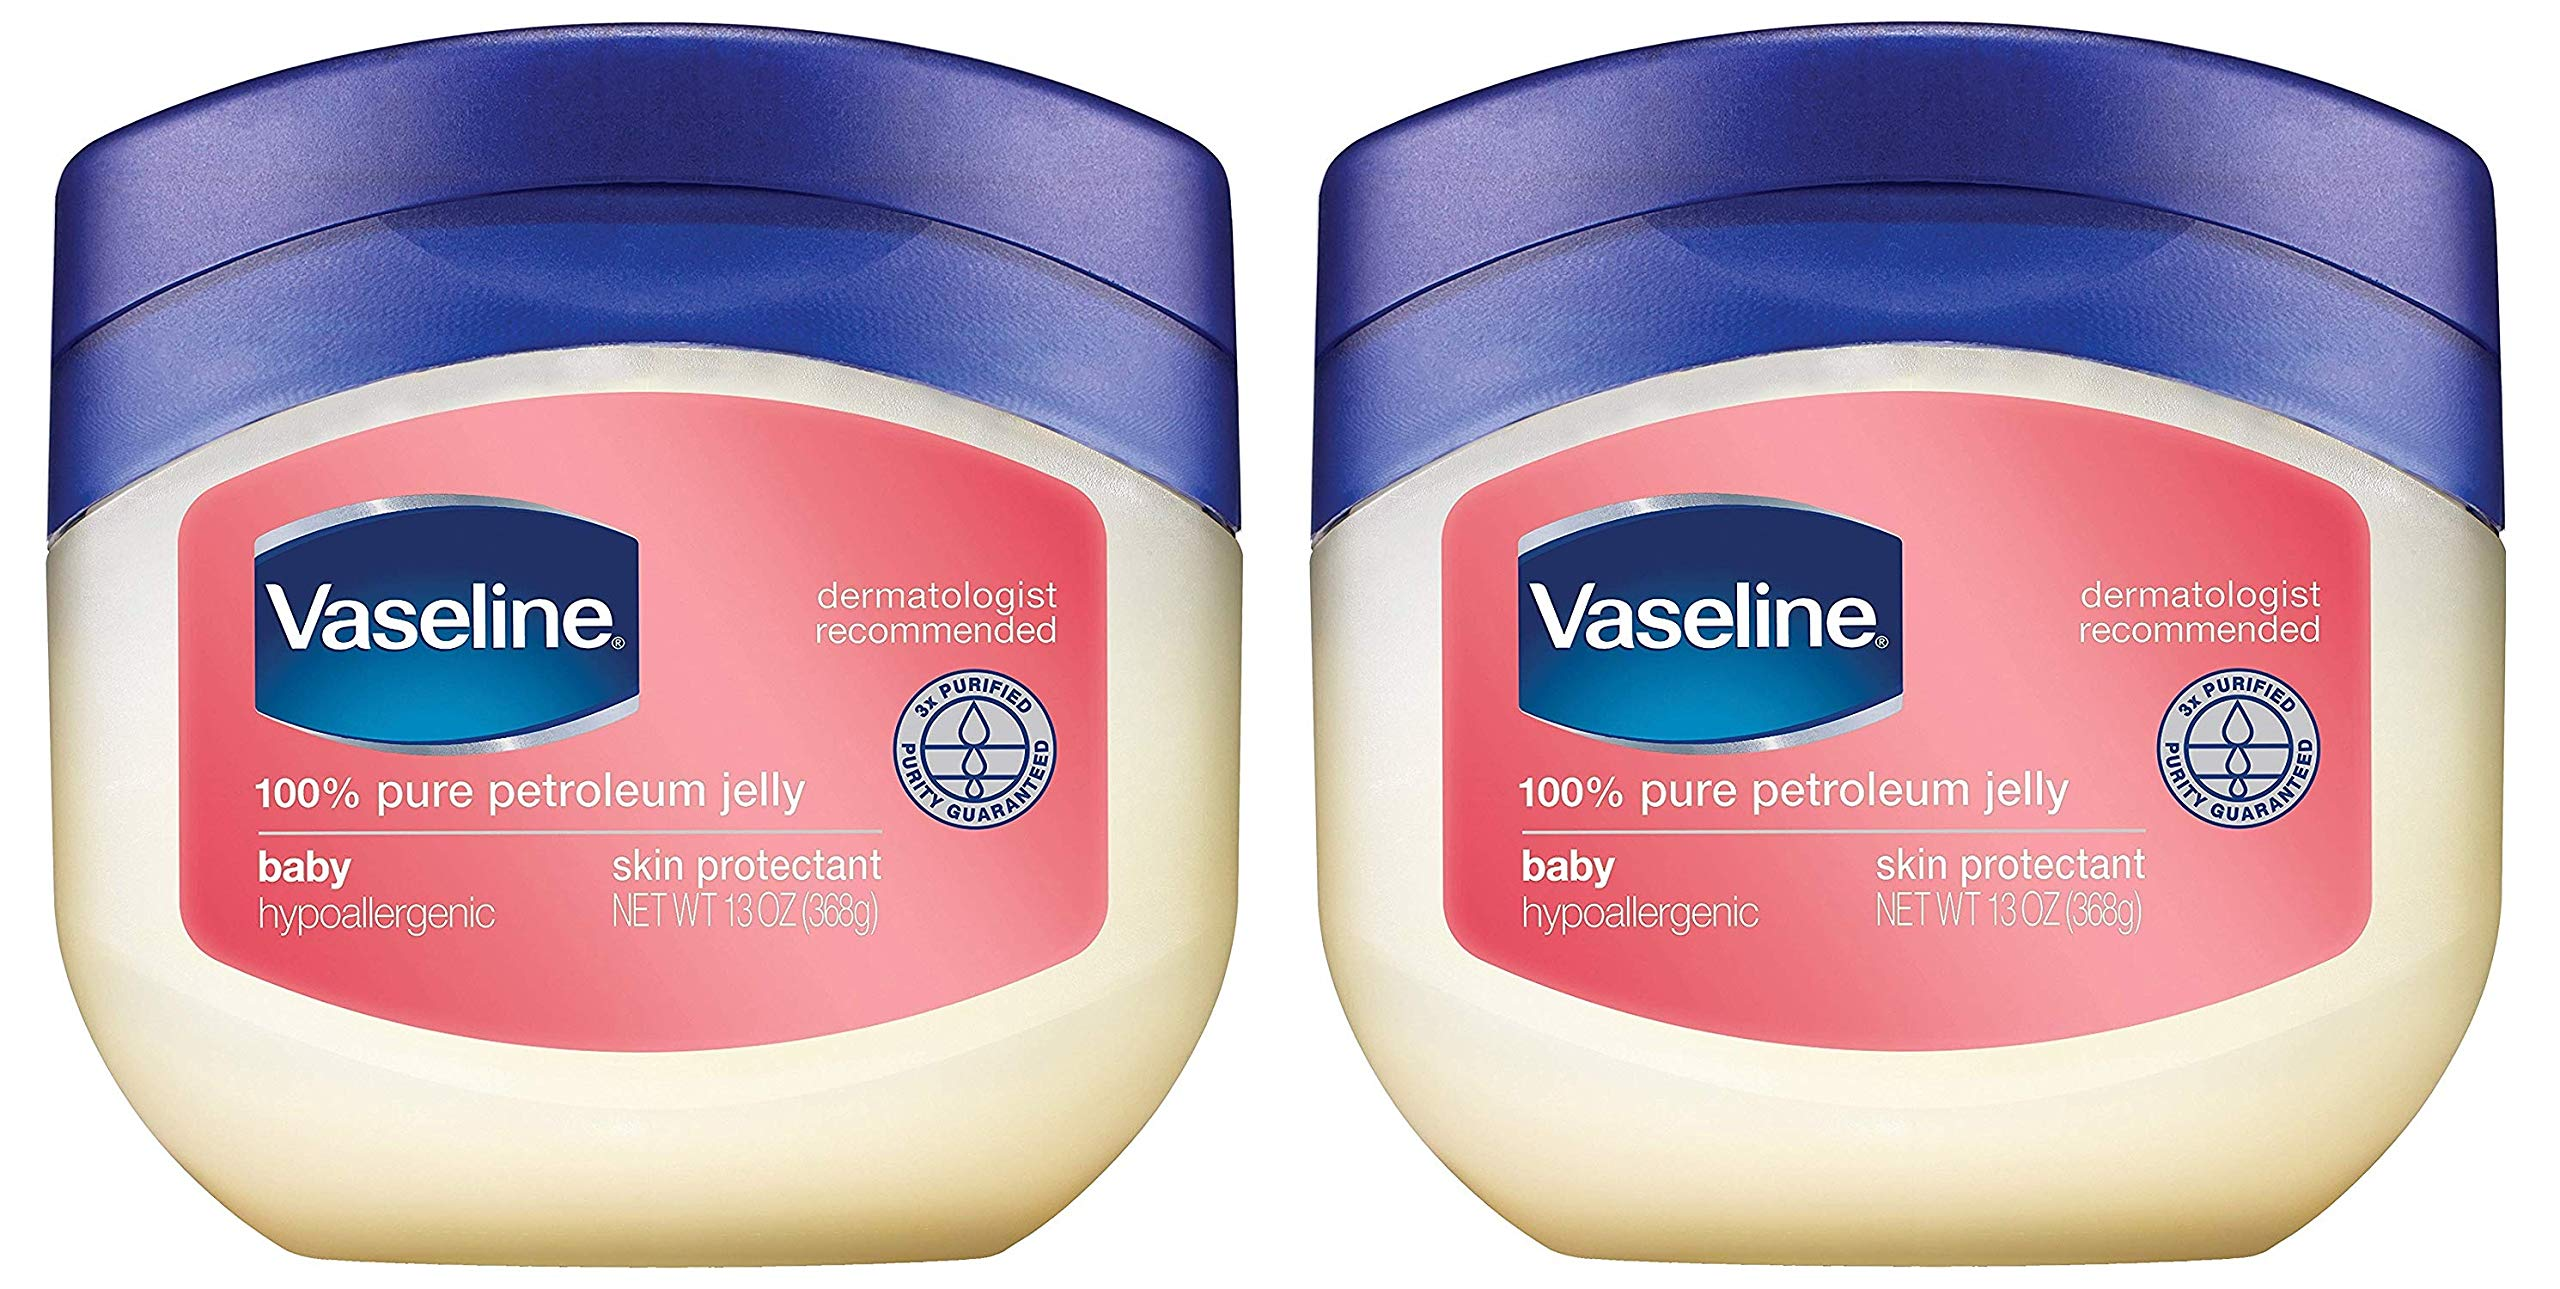 Vaseline 100% Pure Petroleum Jelly, Baby 13 oz (Pack of 3) - Amazon